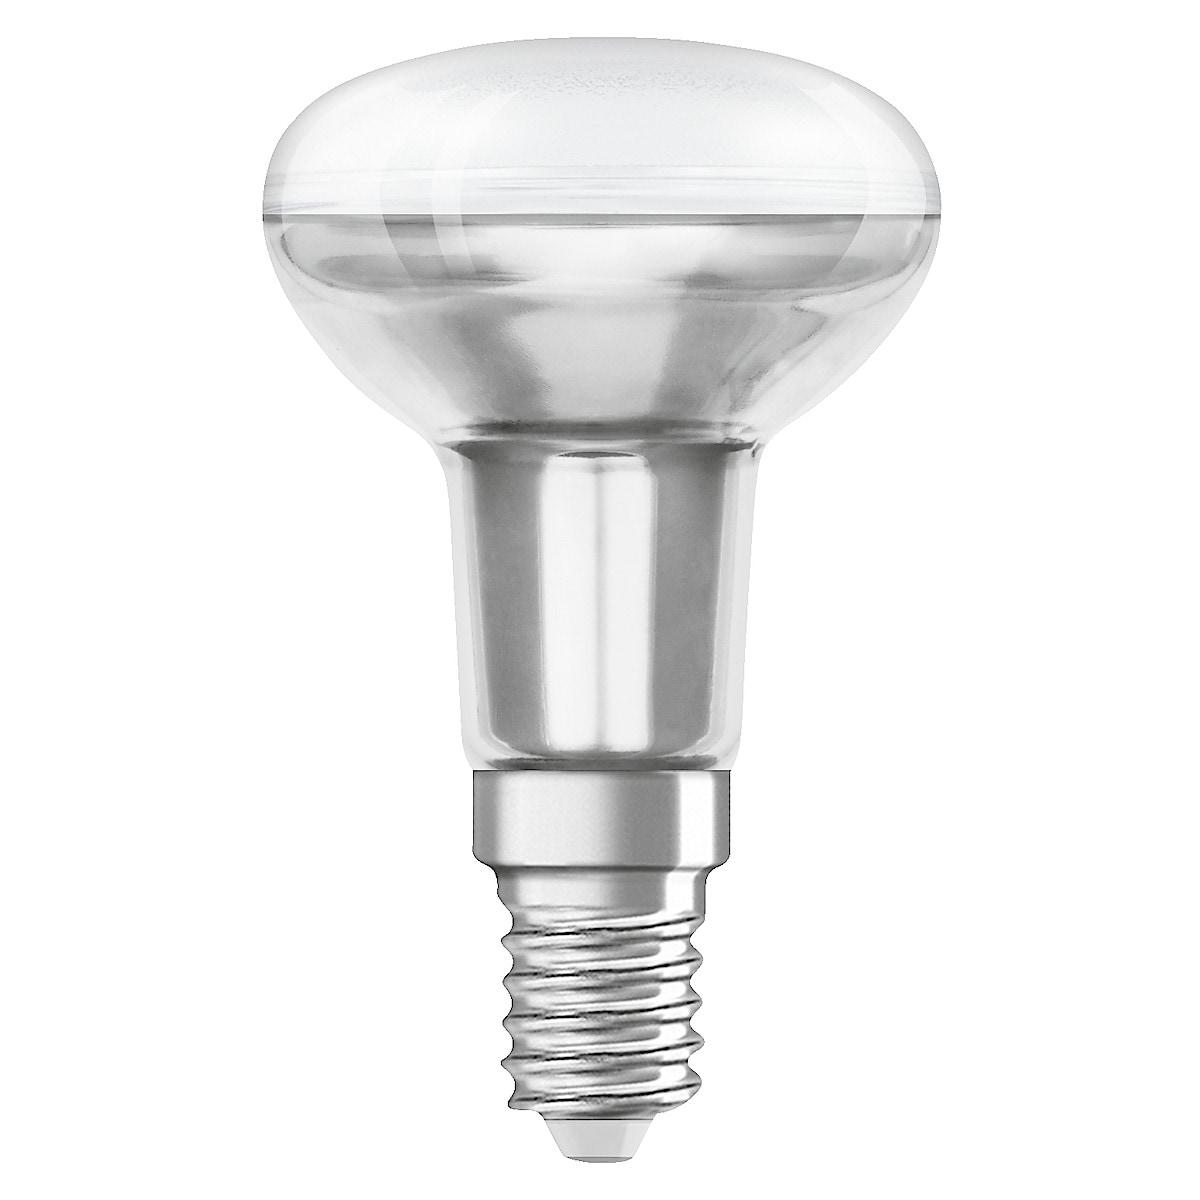 Reflektorlampa LED R50 E14 Osram | Clas Ohlson